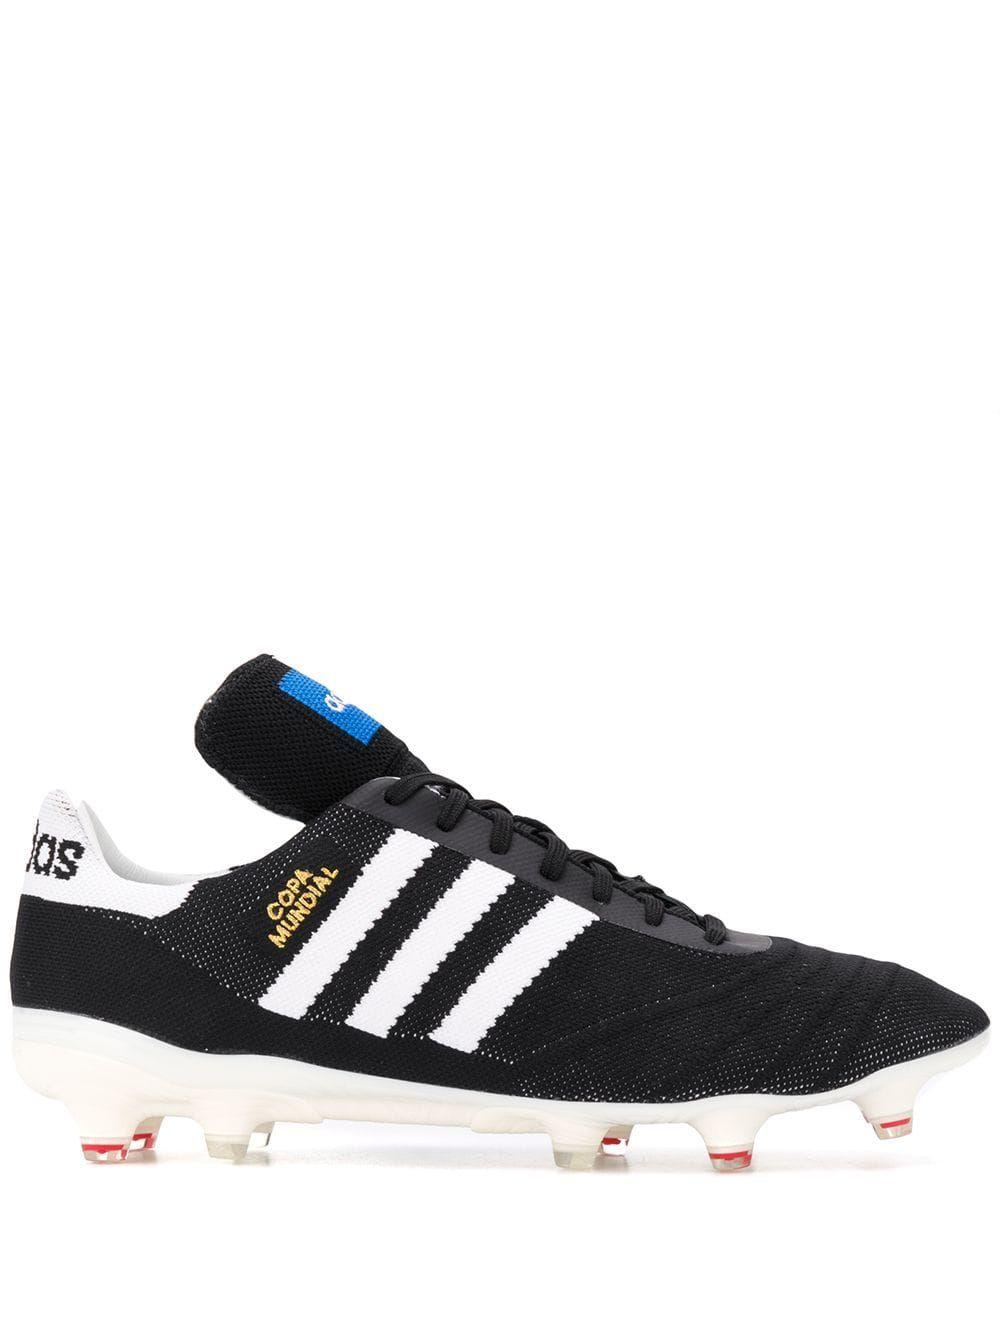 Adidas Originals Copa Mundial 70 Yrs